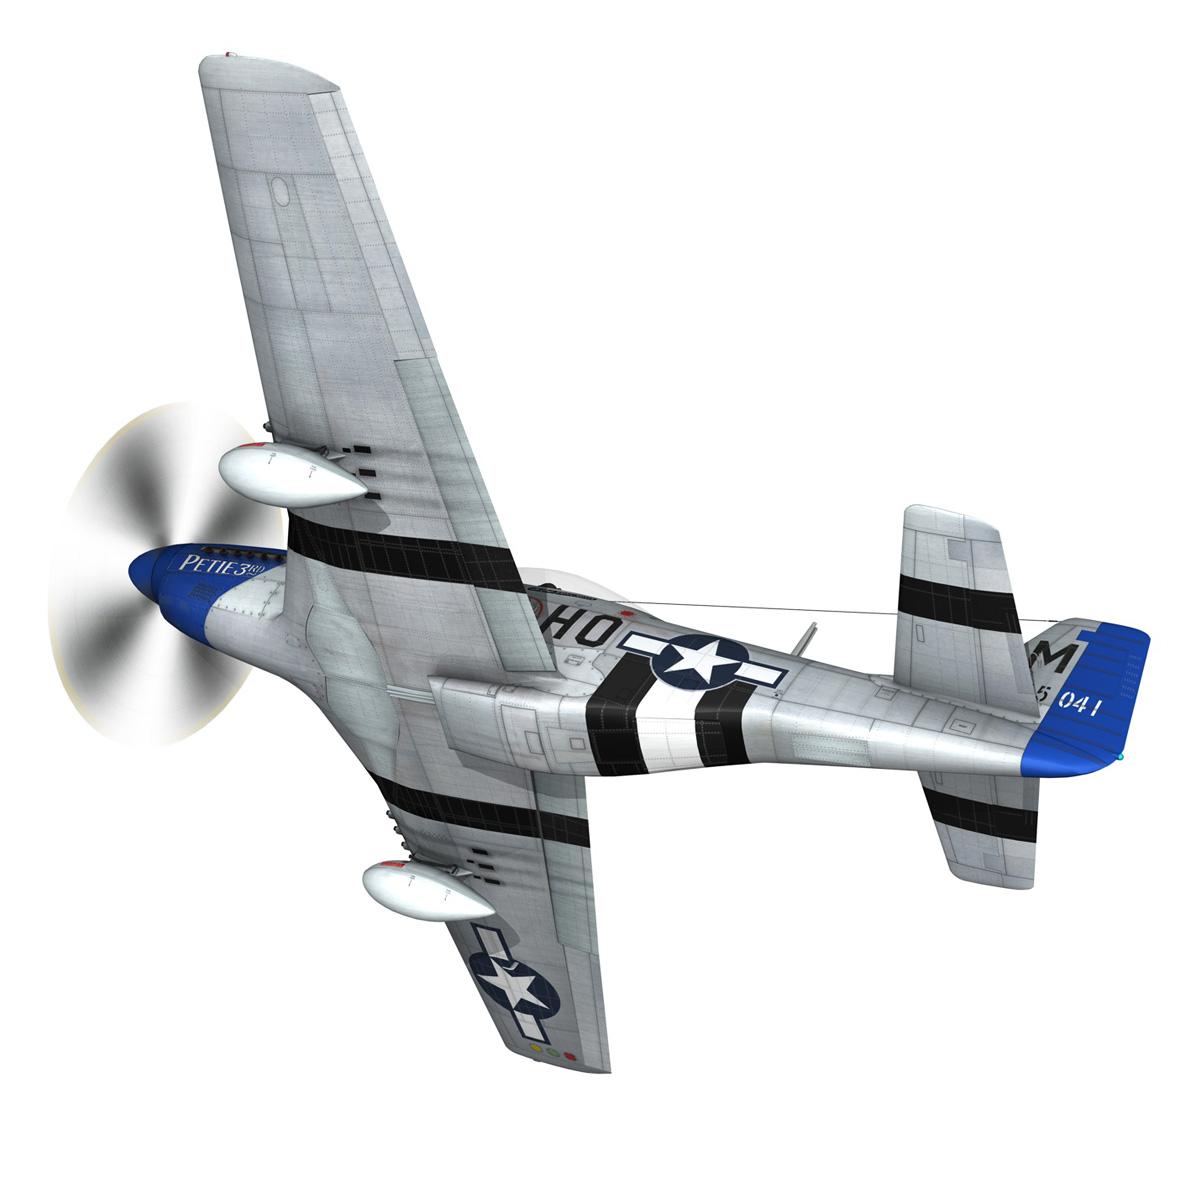 north american p-51d mustang – petie 3rd 3d model fbx c4d lwo obj 280131